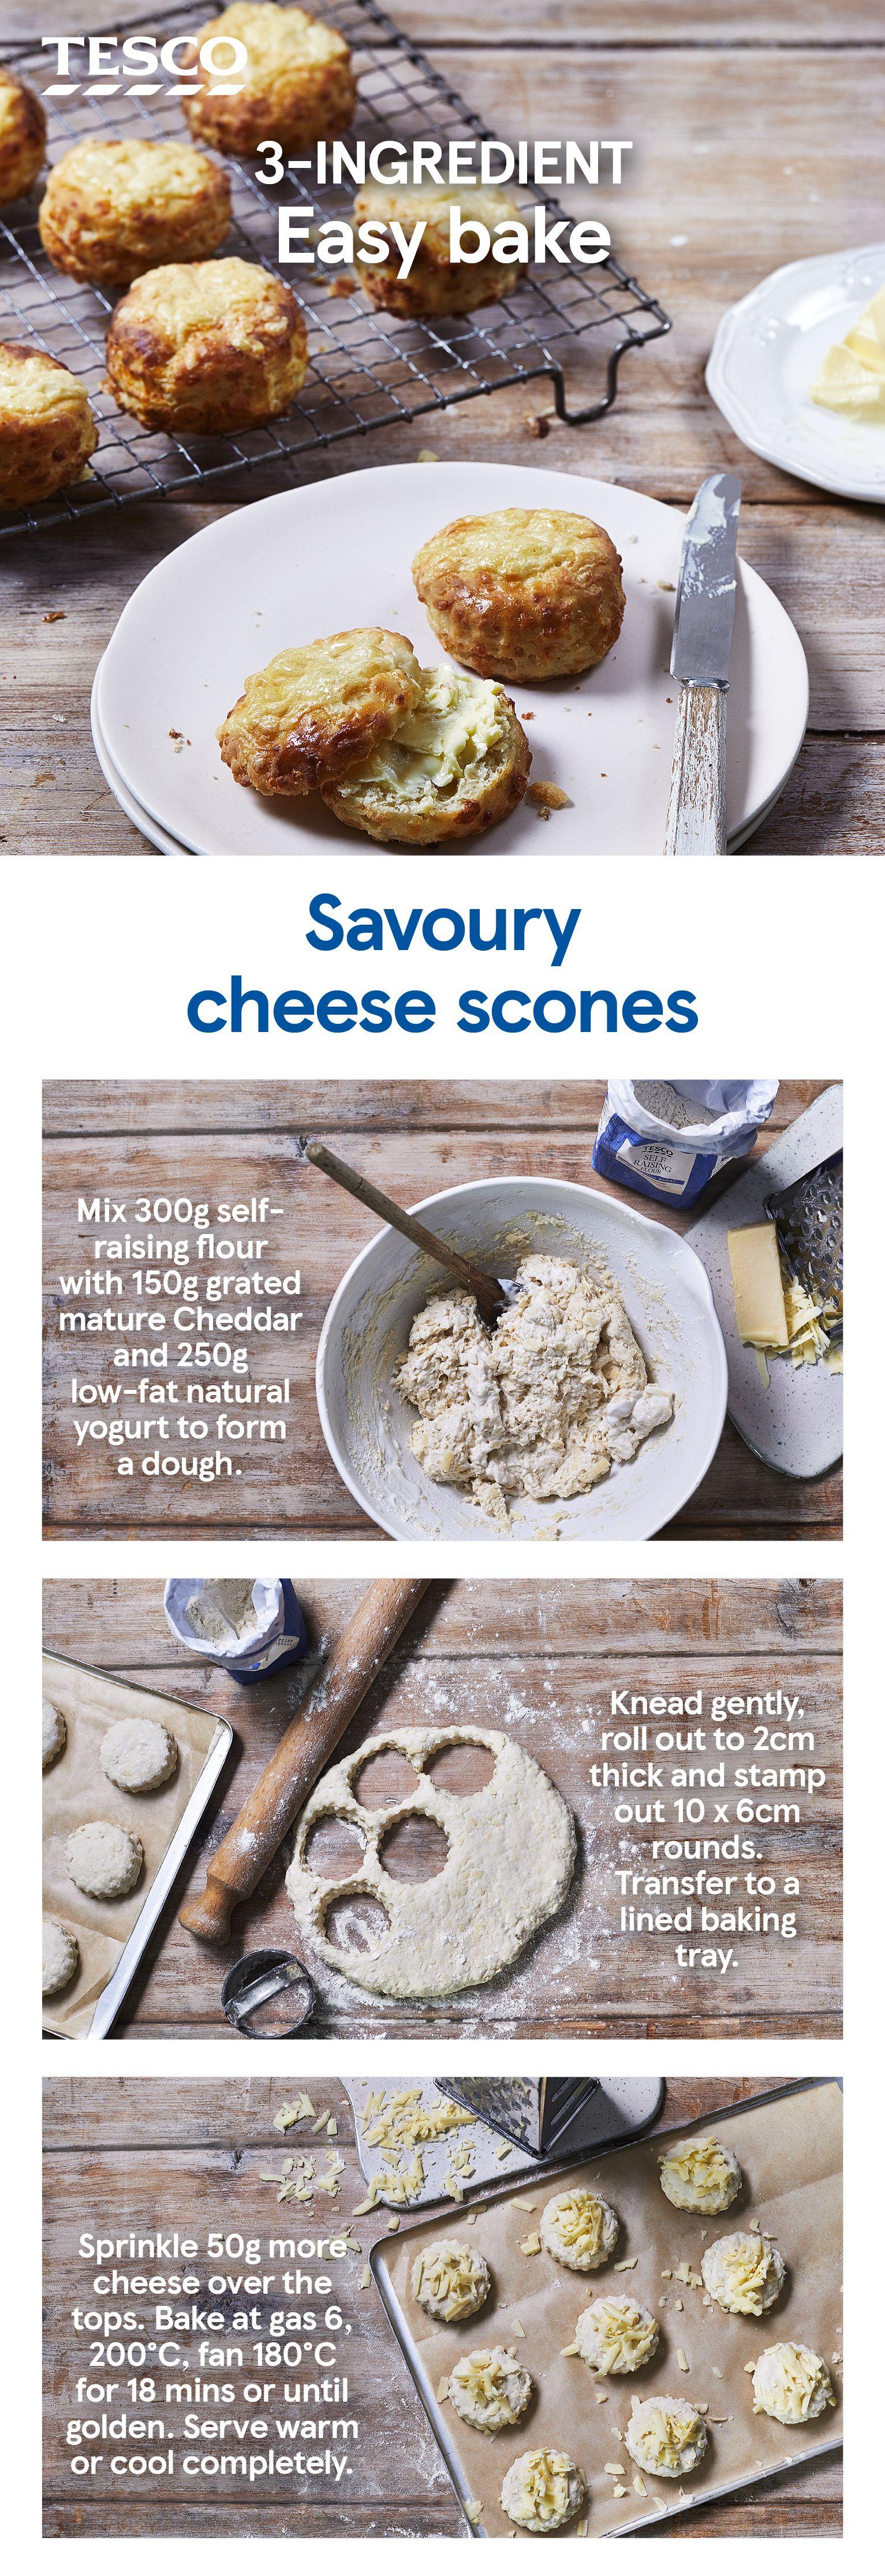 3 Ingredient Savoury Cheese Scones Recipe Cheese Scones Savoury Food Recipes